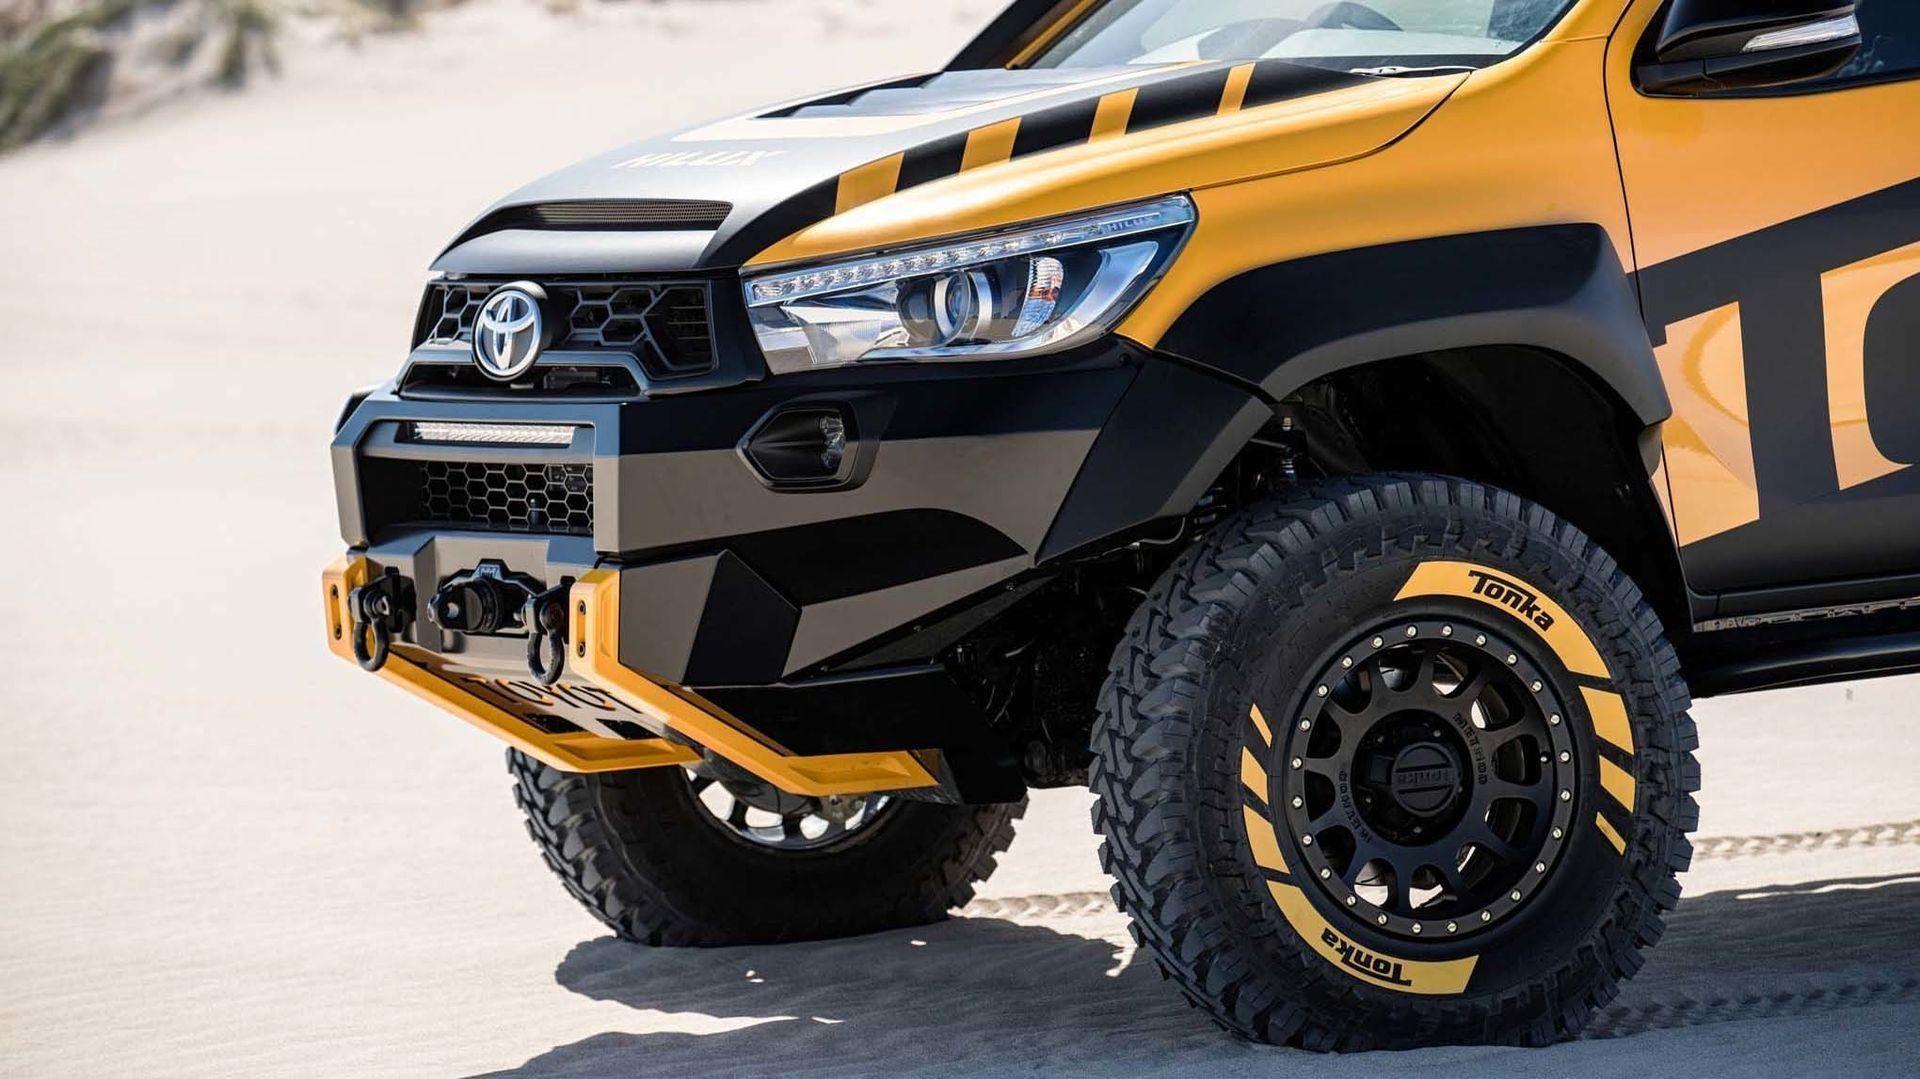 Toyota Hilux Tonka Concept Un Juguete Para Ninos Ya Crecidos Foto